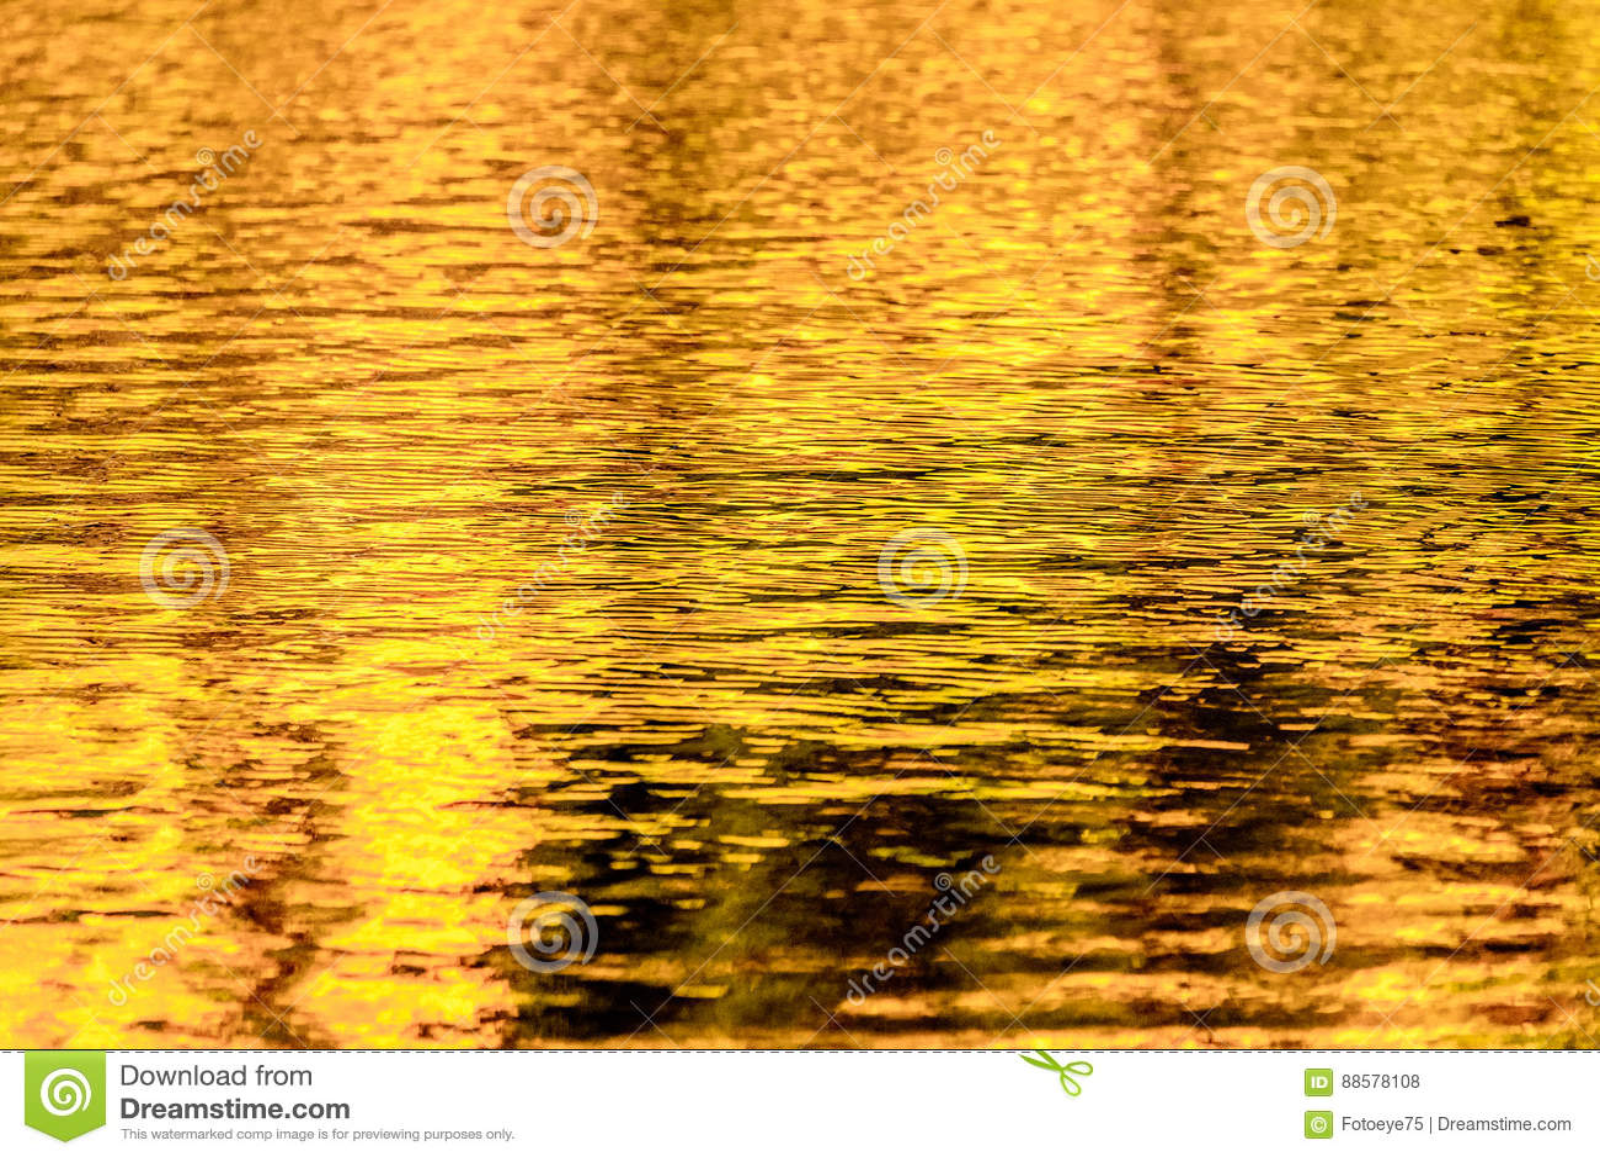 Gold autumn lake reflections